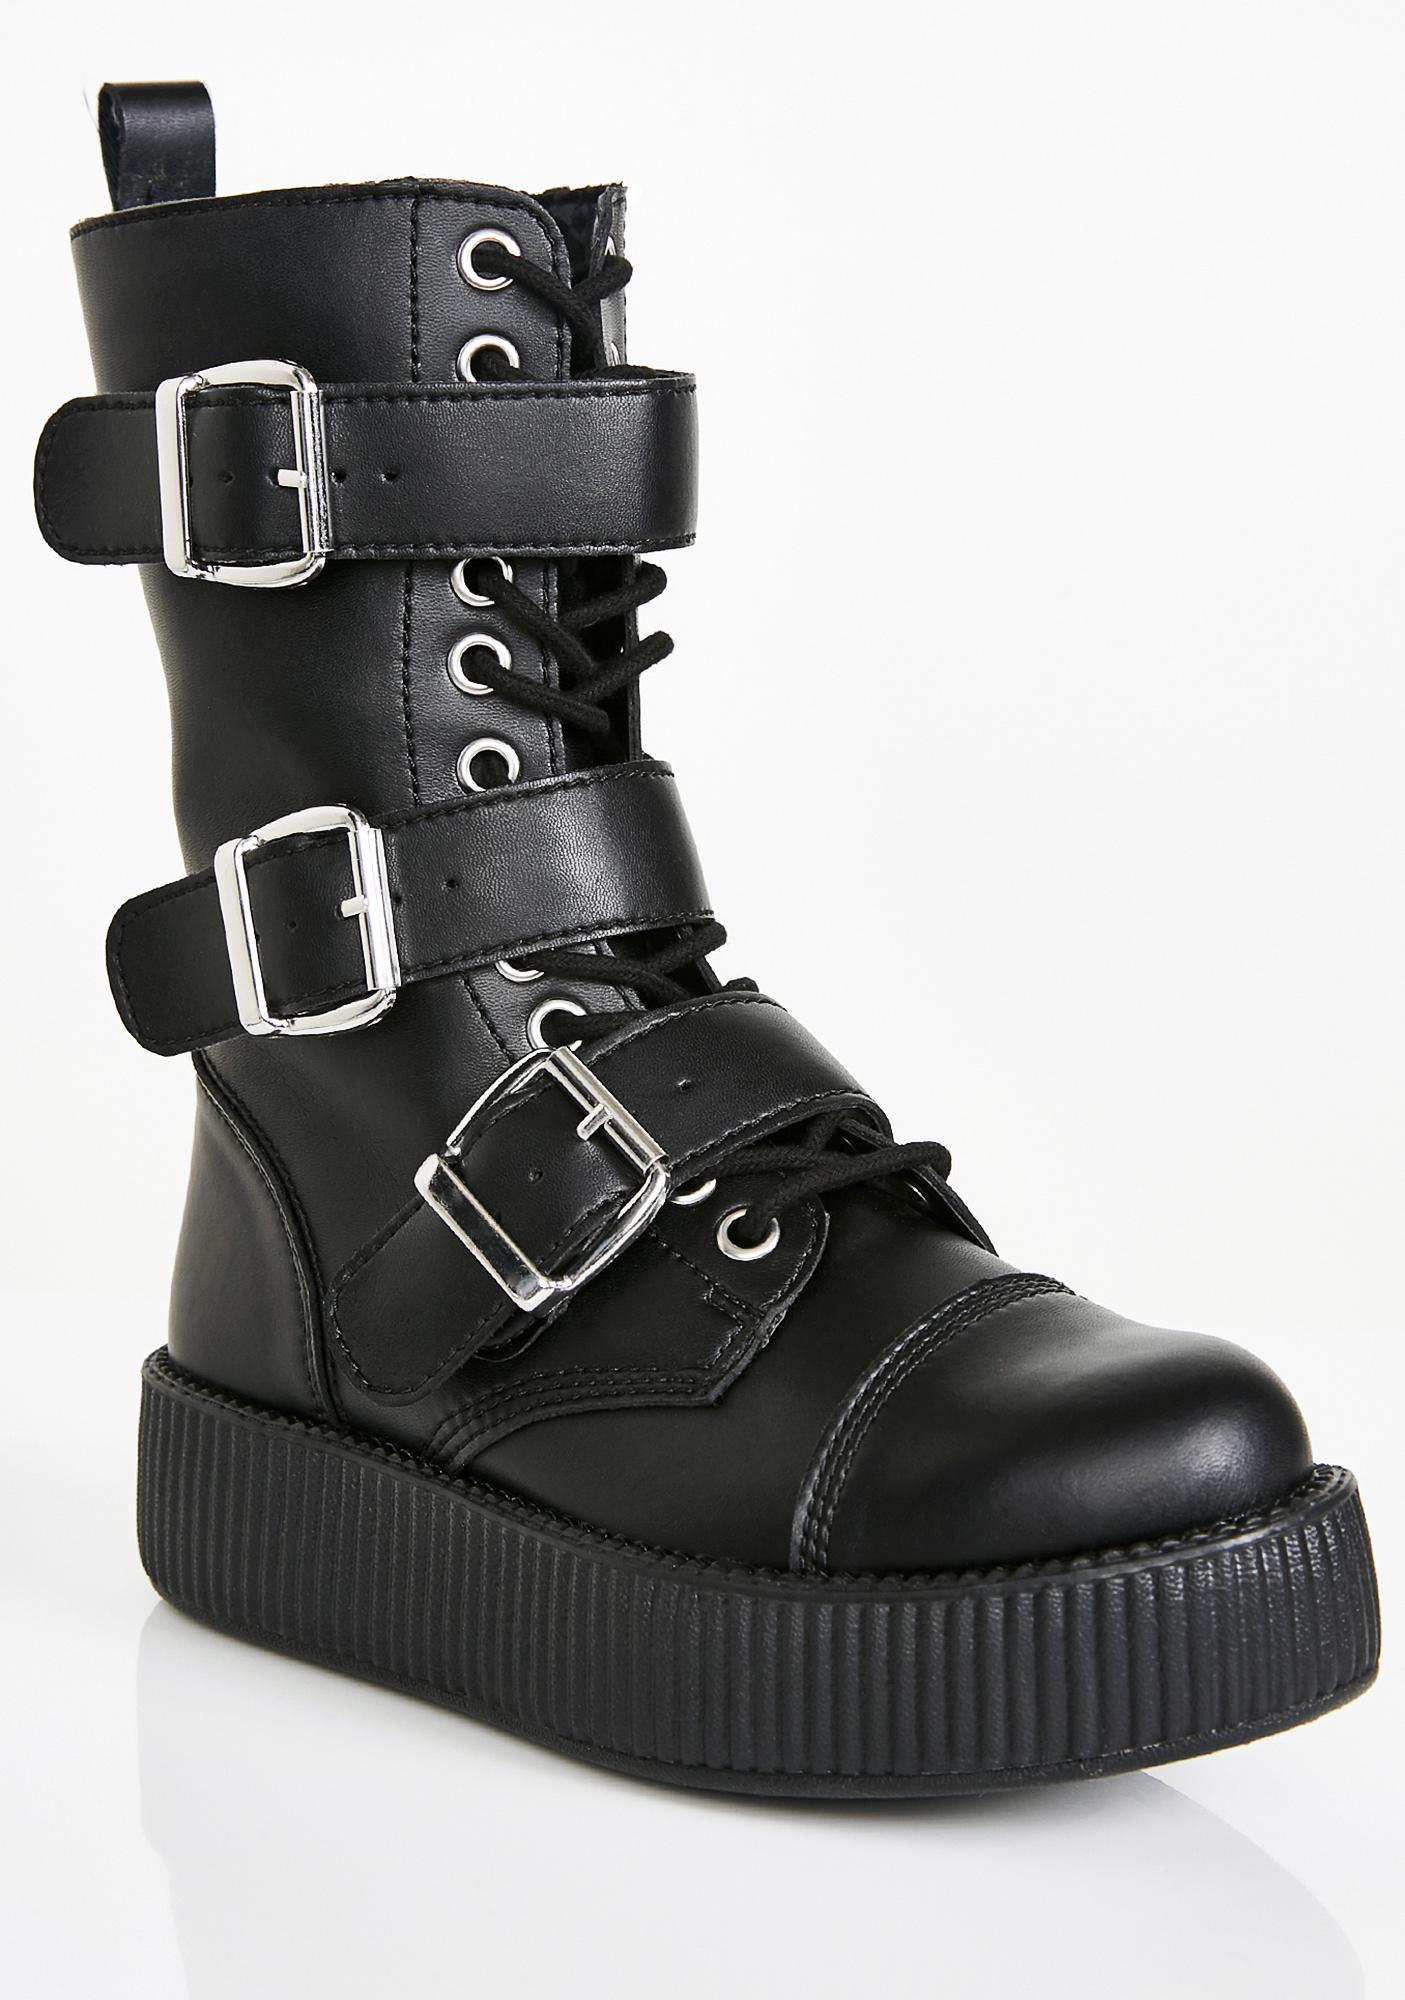 T.U.K. Viva Mondo Creeper Boots